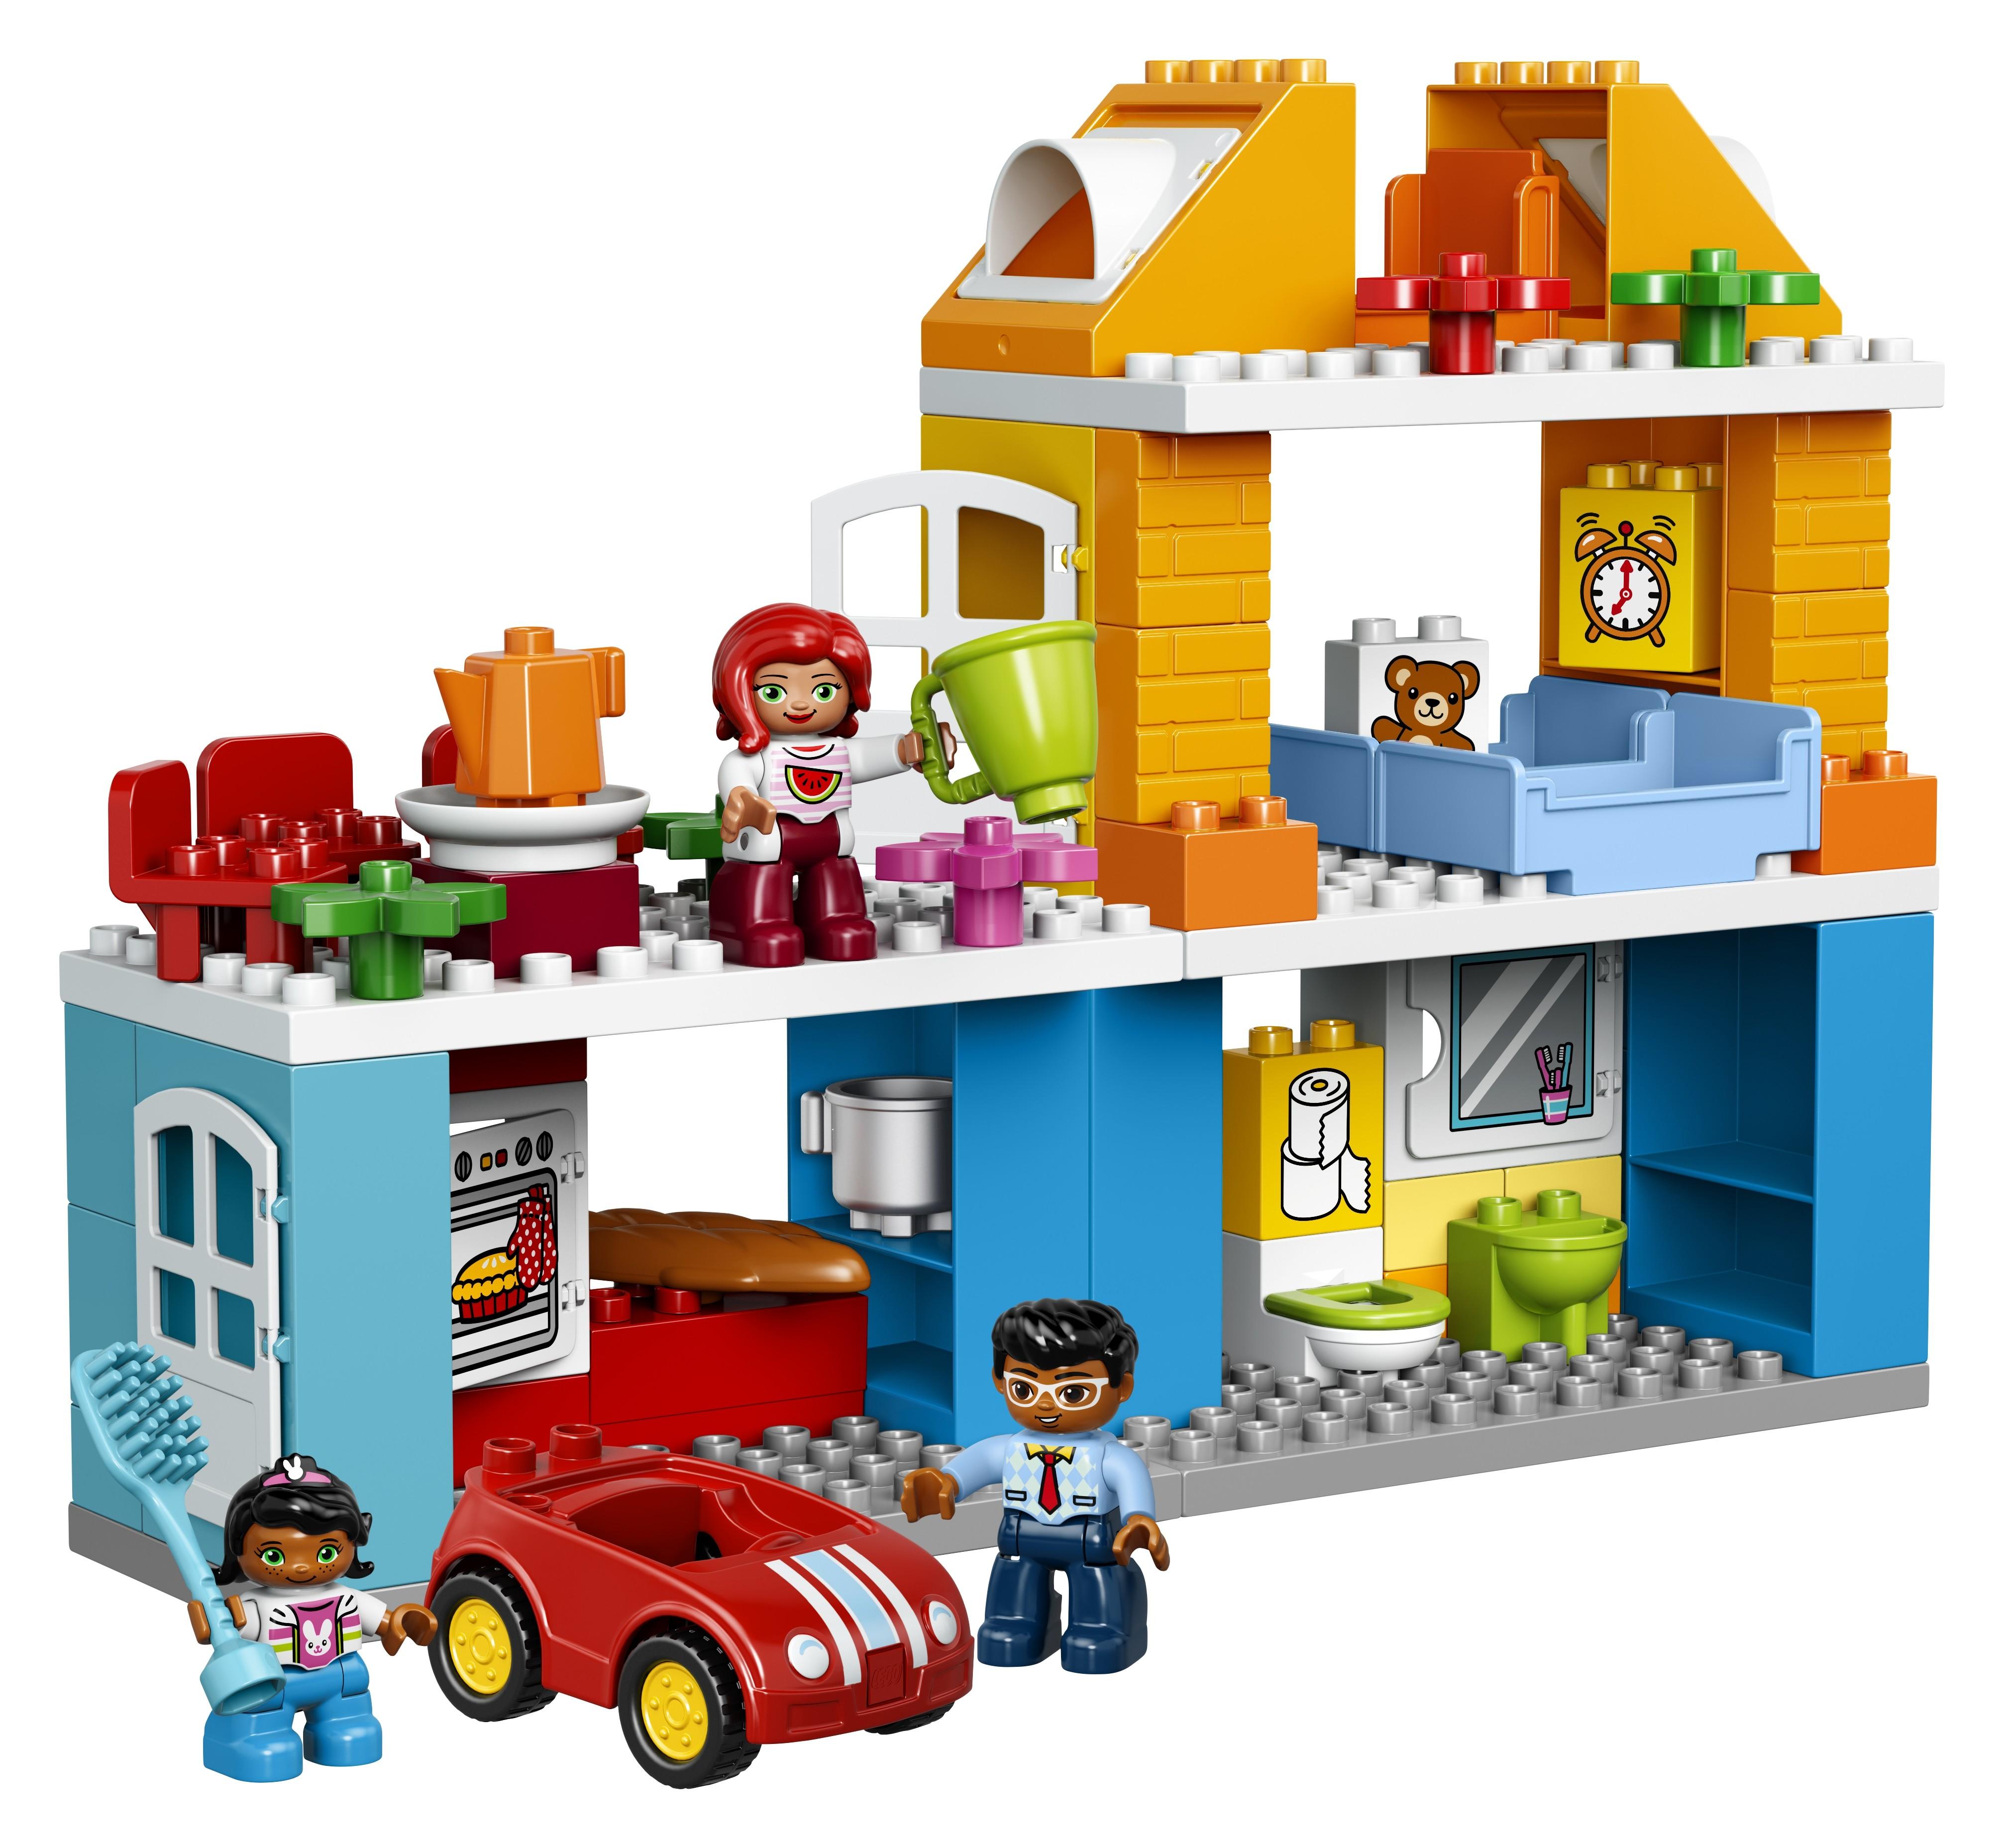 LEGO DUPLO LEGO Duplo Town 10835 Семейный дом